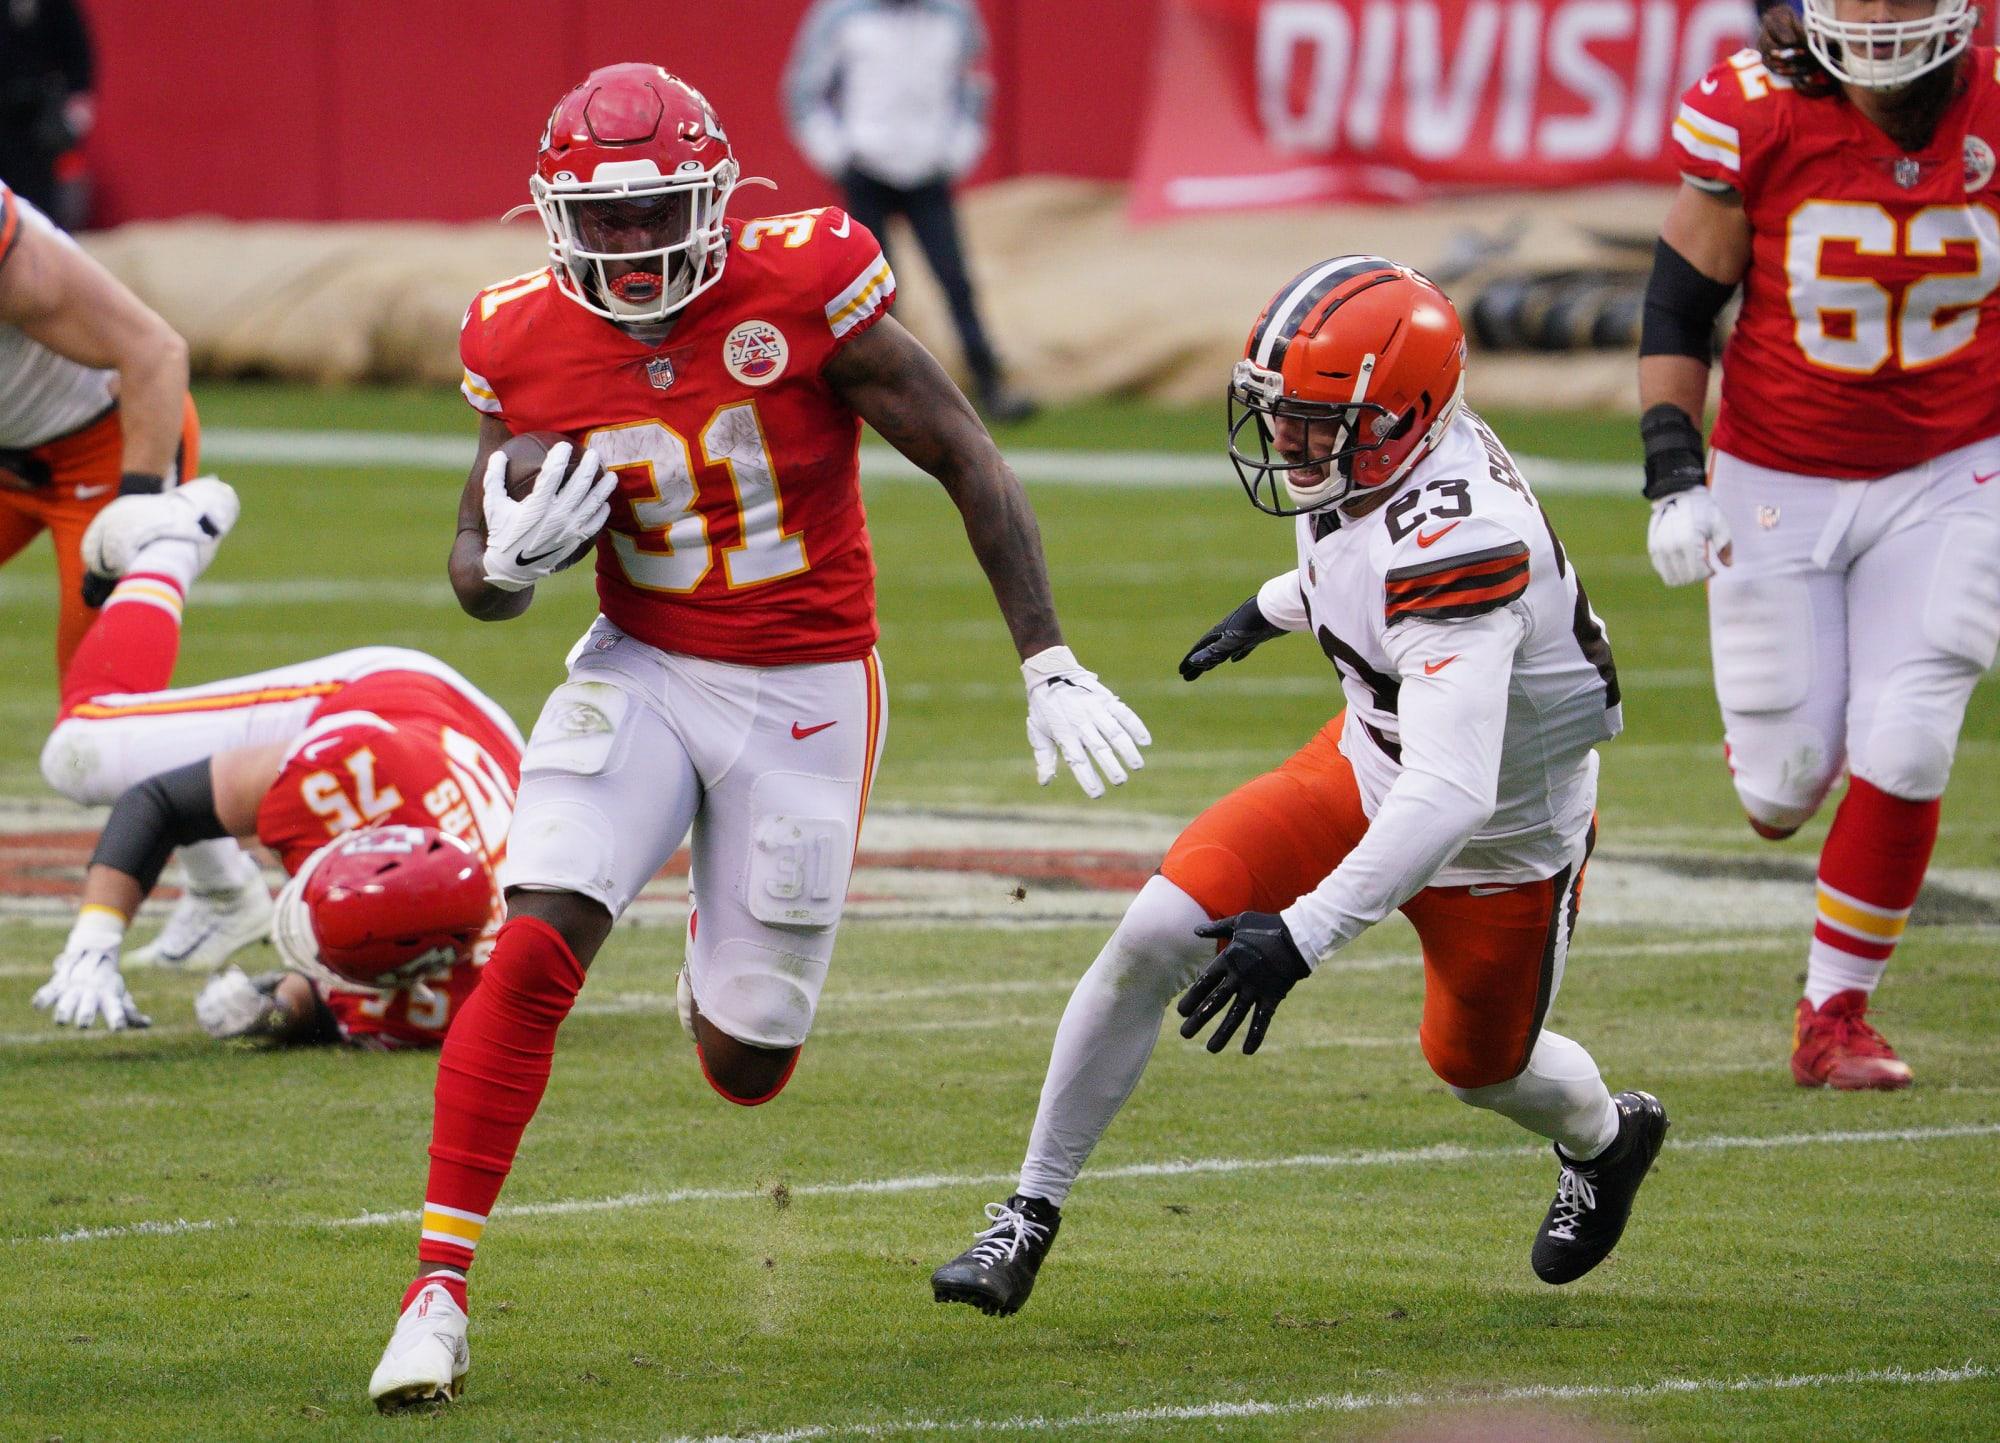 KC Chiefs: Running the ball is the key to victory vs Buffalo Bills